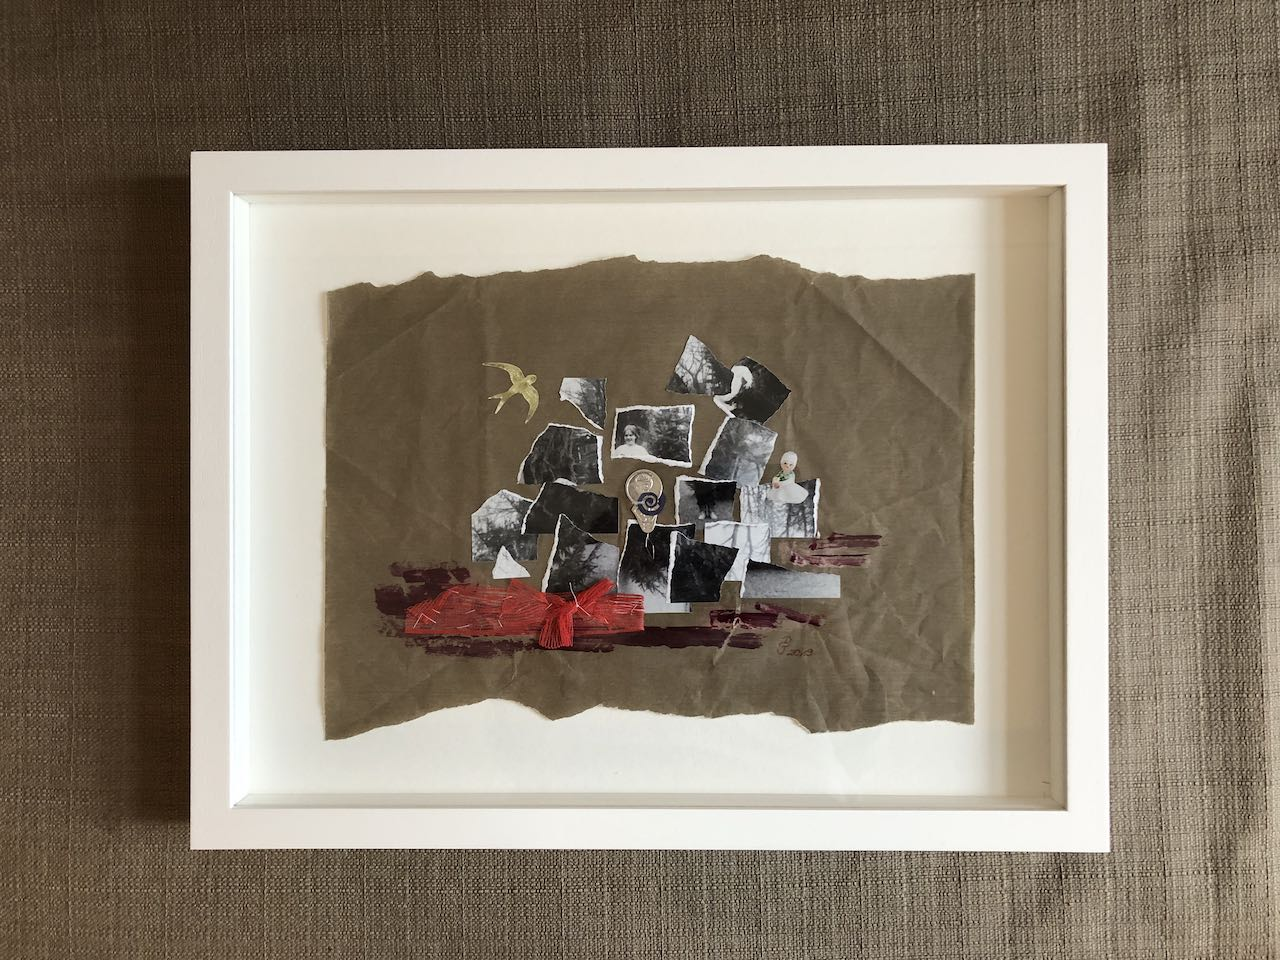 Neuordnung, Collage, Materialmix, 2019, (c) Doreen Trittel